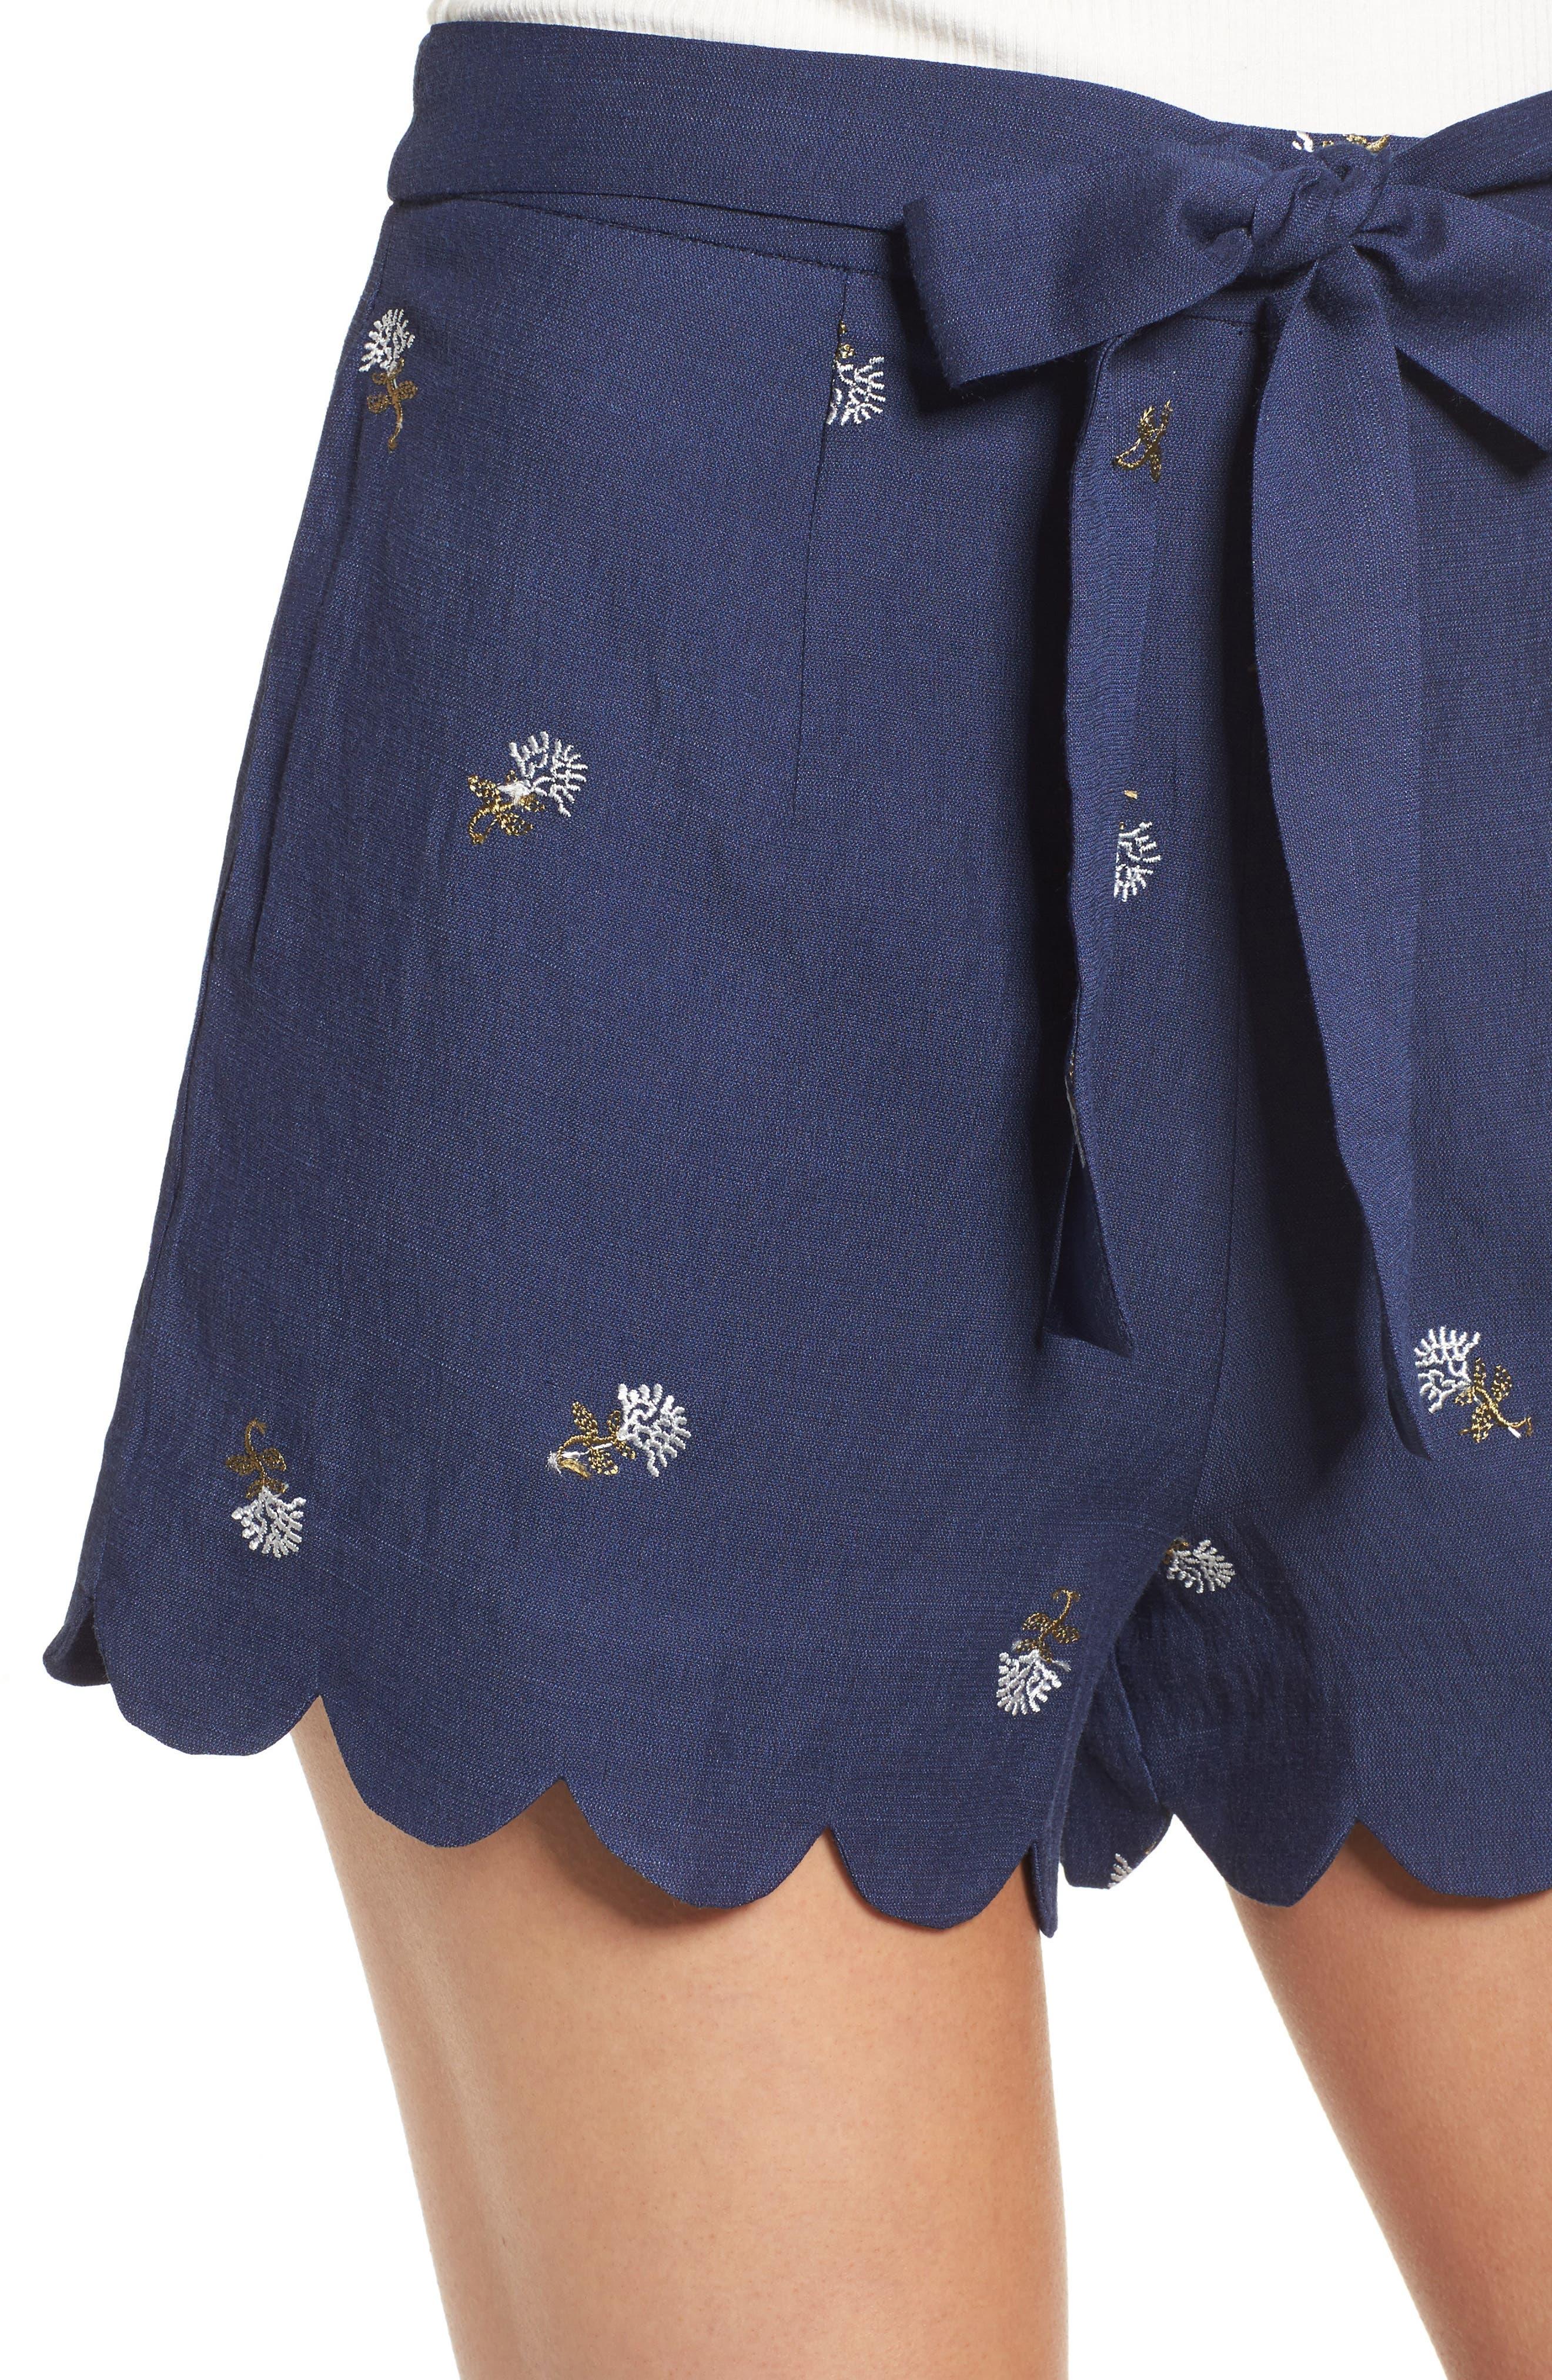 High Waist Scallop Hem Shorts,                             Alternate thumbnail 4, color,                             400